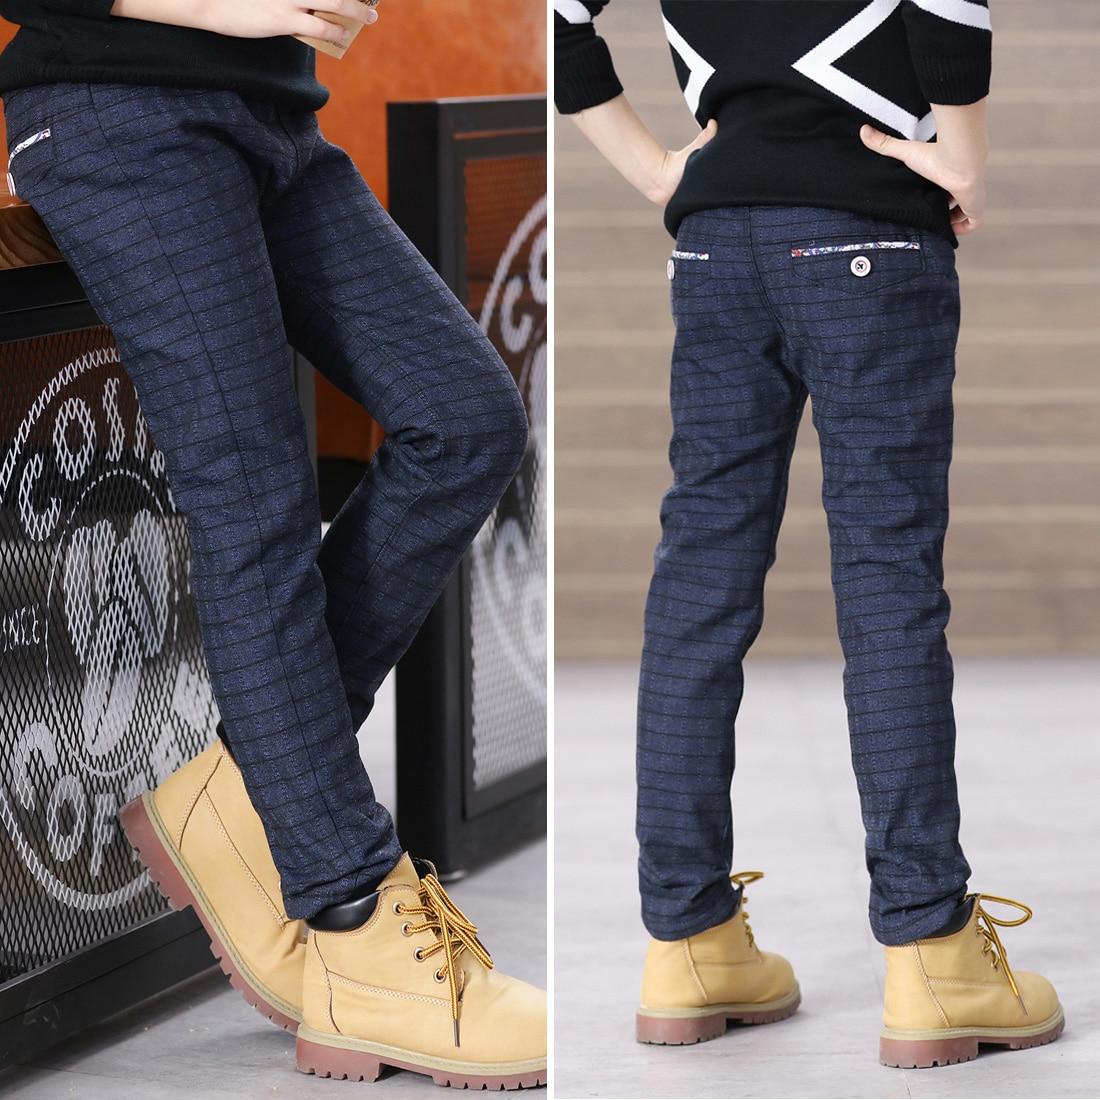 Plaid Boys Straight Pants Trousers Full Length Casual Pants Kids Trousers Boy Pants Kids Toddler Pants Cildrens Plaid